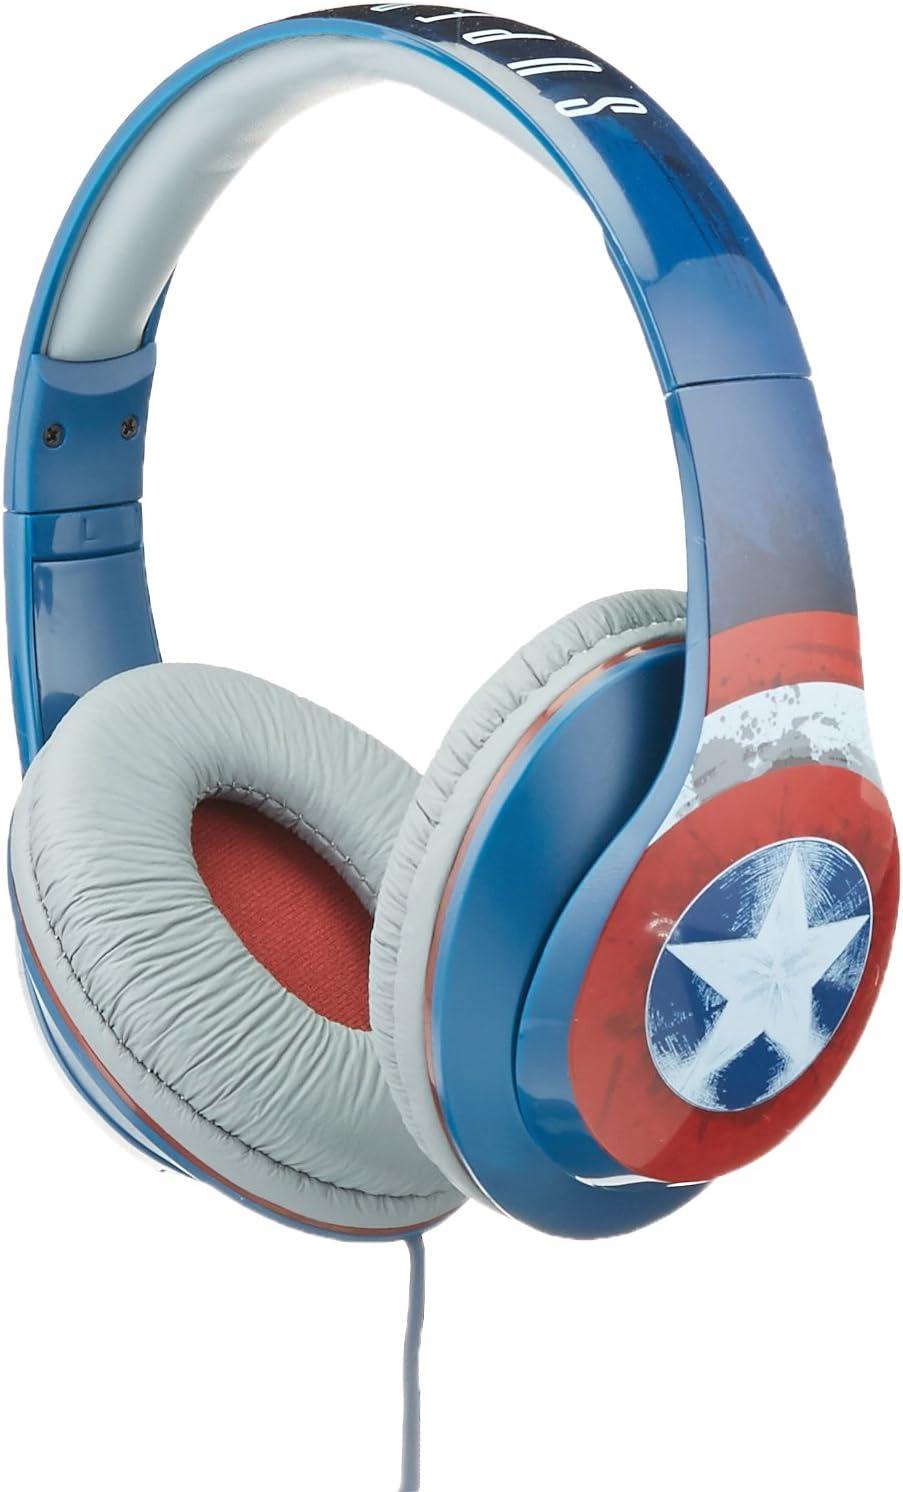 Ekids Marvel Captain America Headphones With Microphone Elektronik